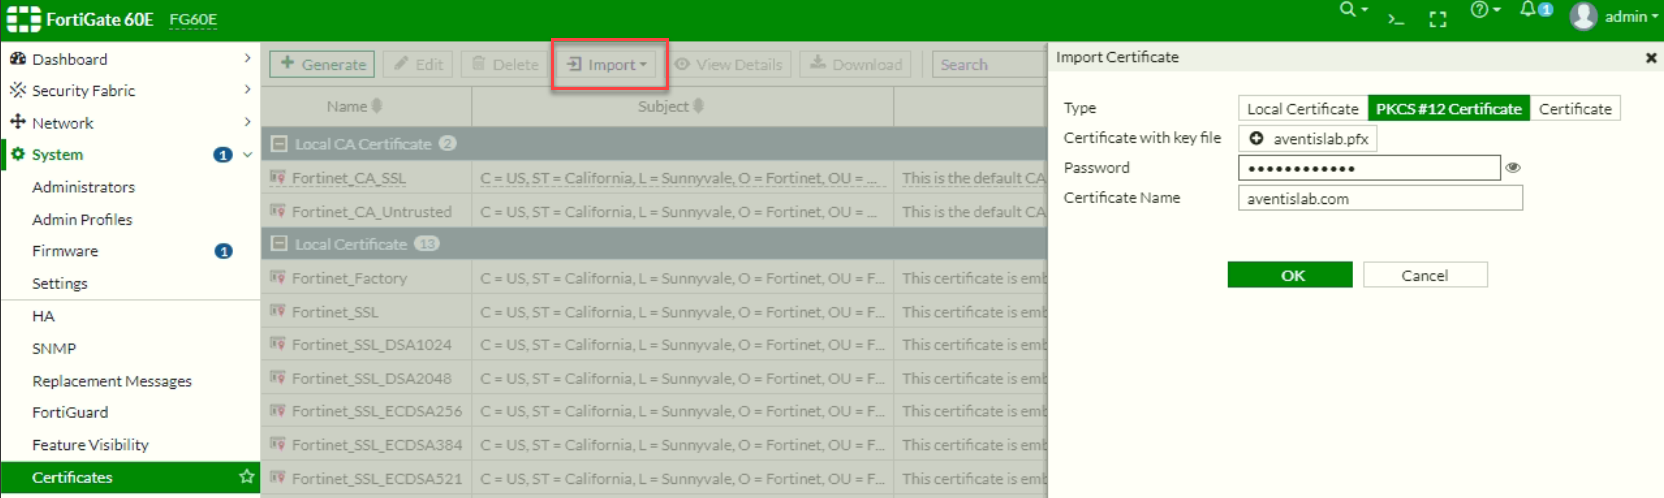 Import SSL Certificate to FortiGate